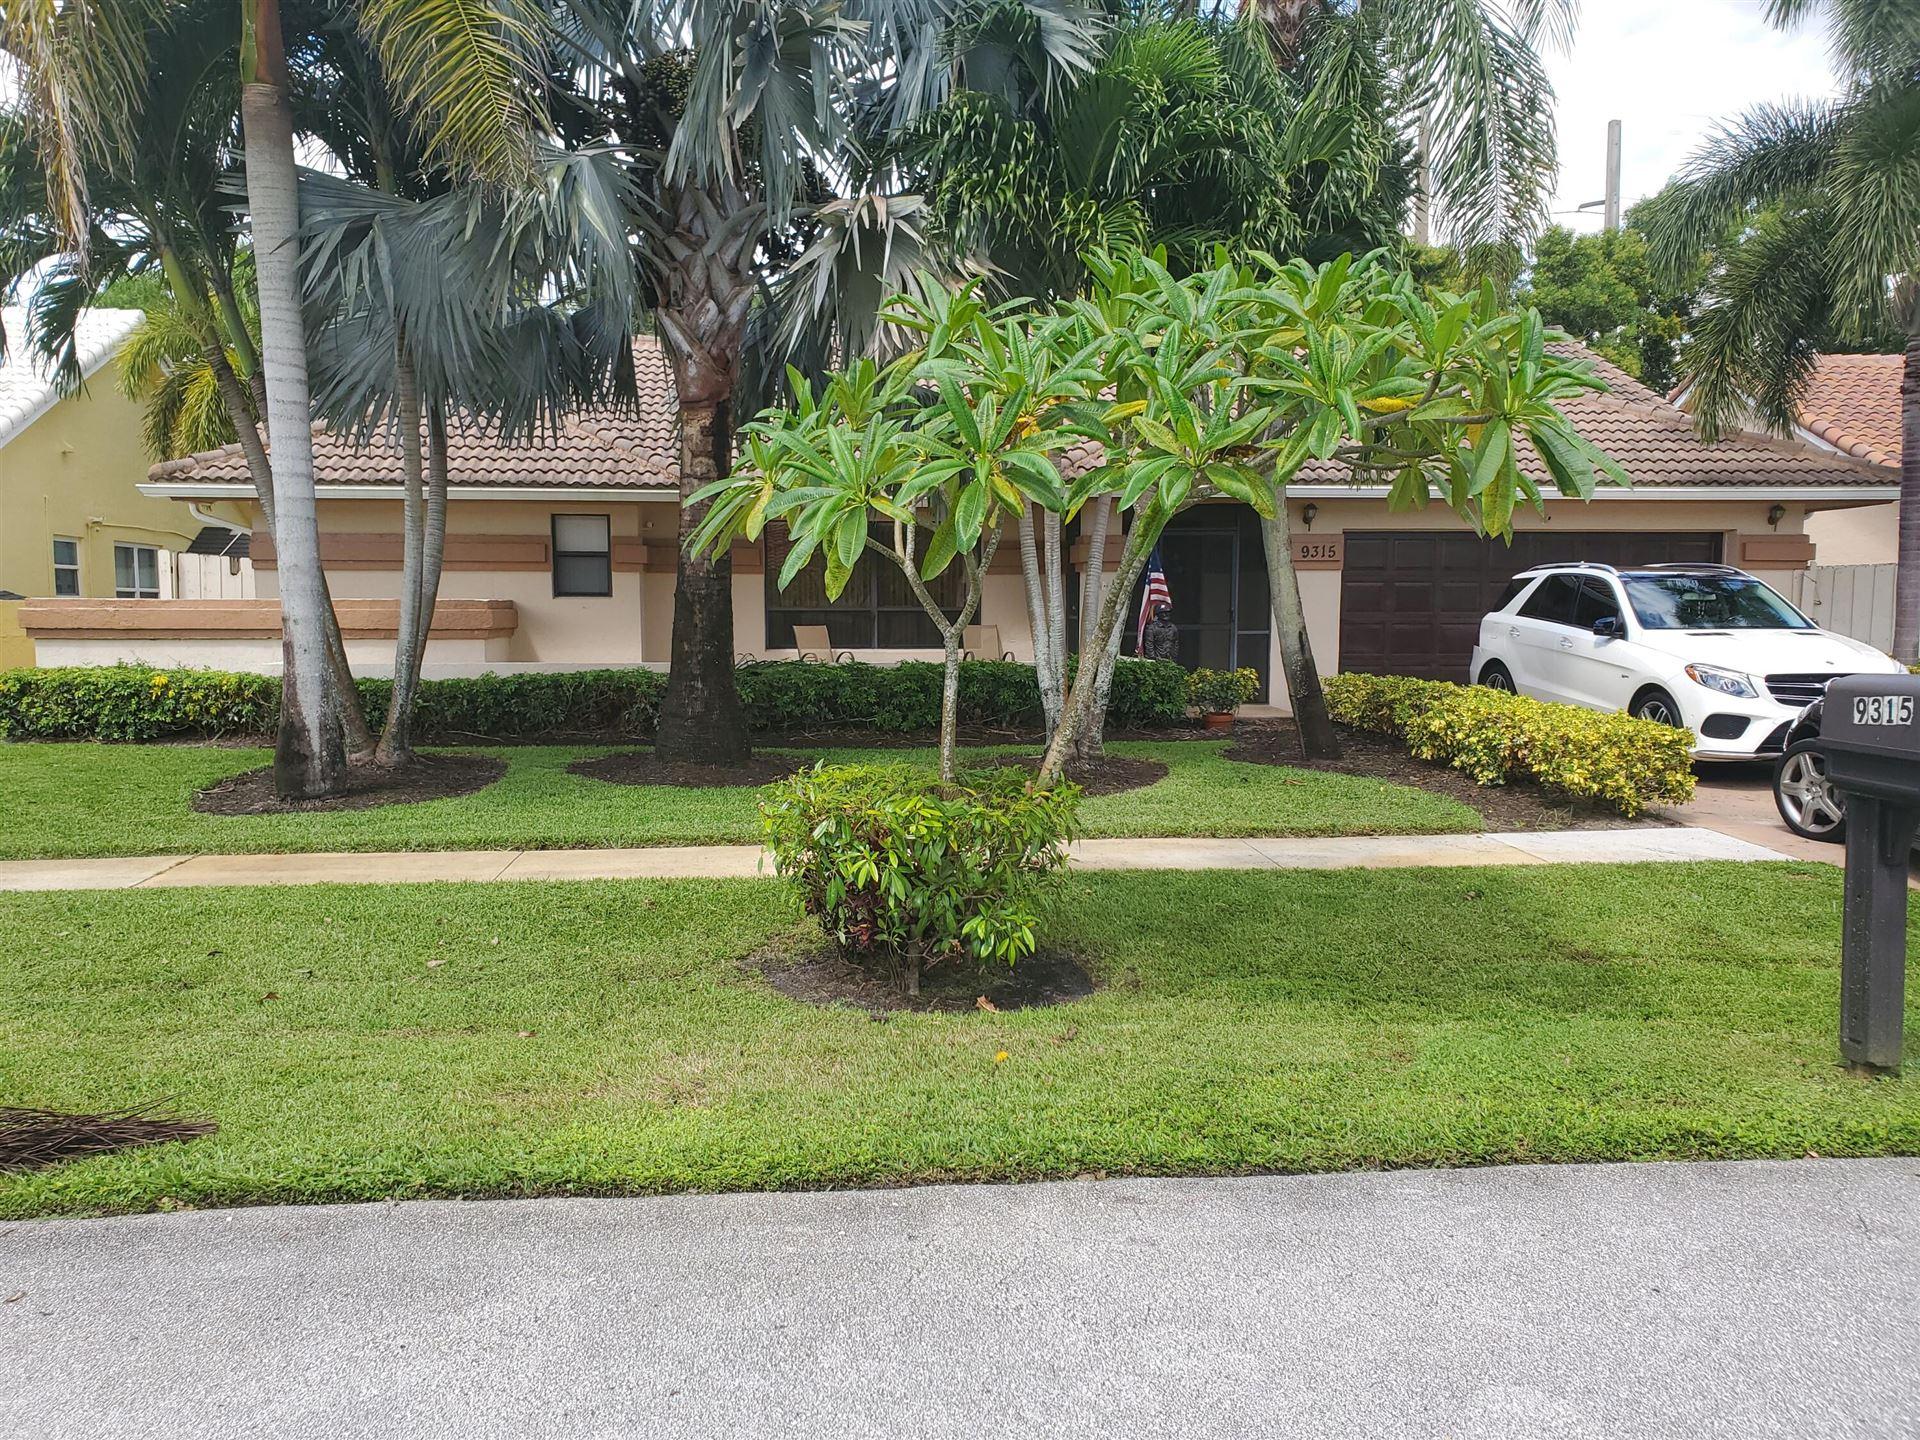 9315 Laurel Green Drive S, Boynton Beach, FL 33437 - MLS#: RX-10749002